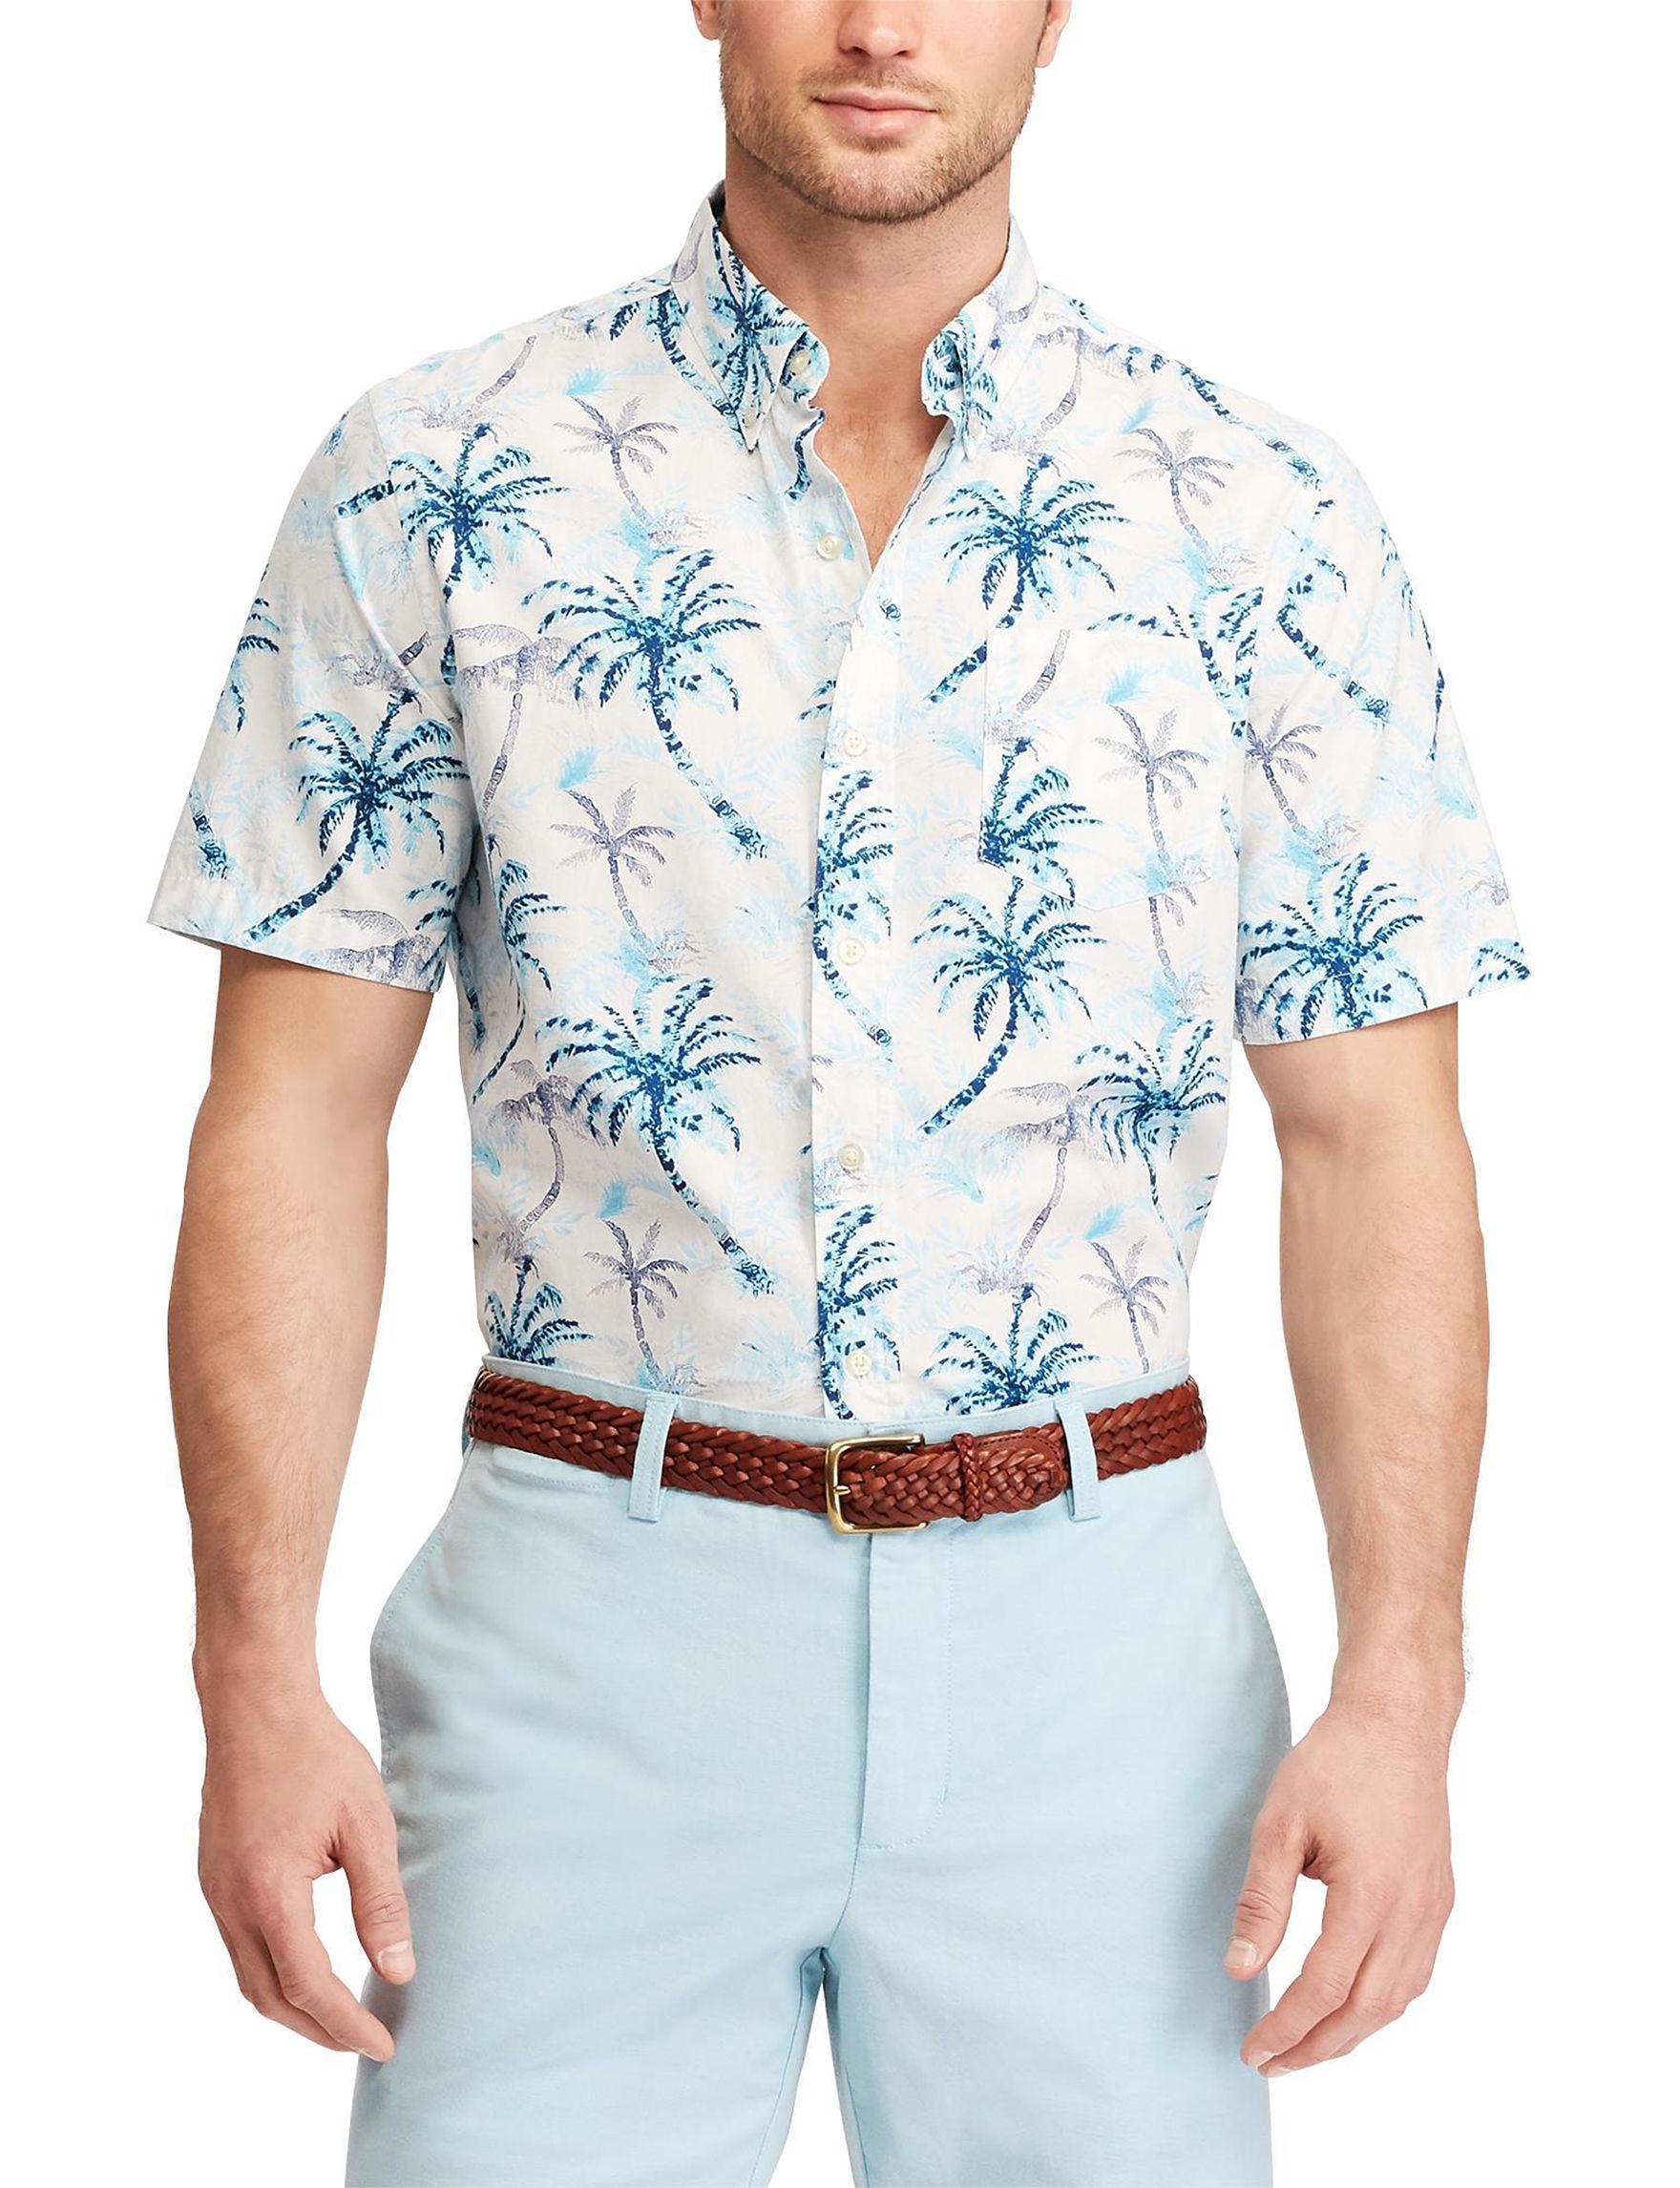 Chaps White Multi Casual Button Down Shirts